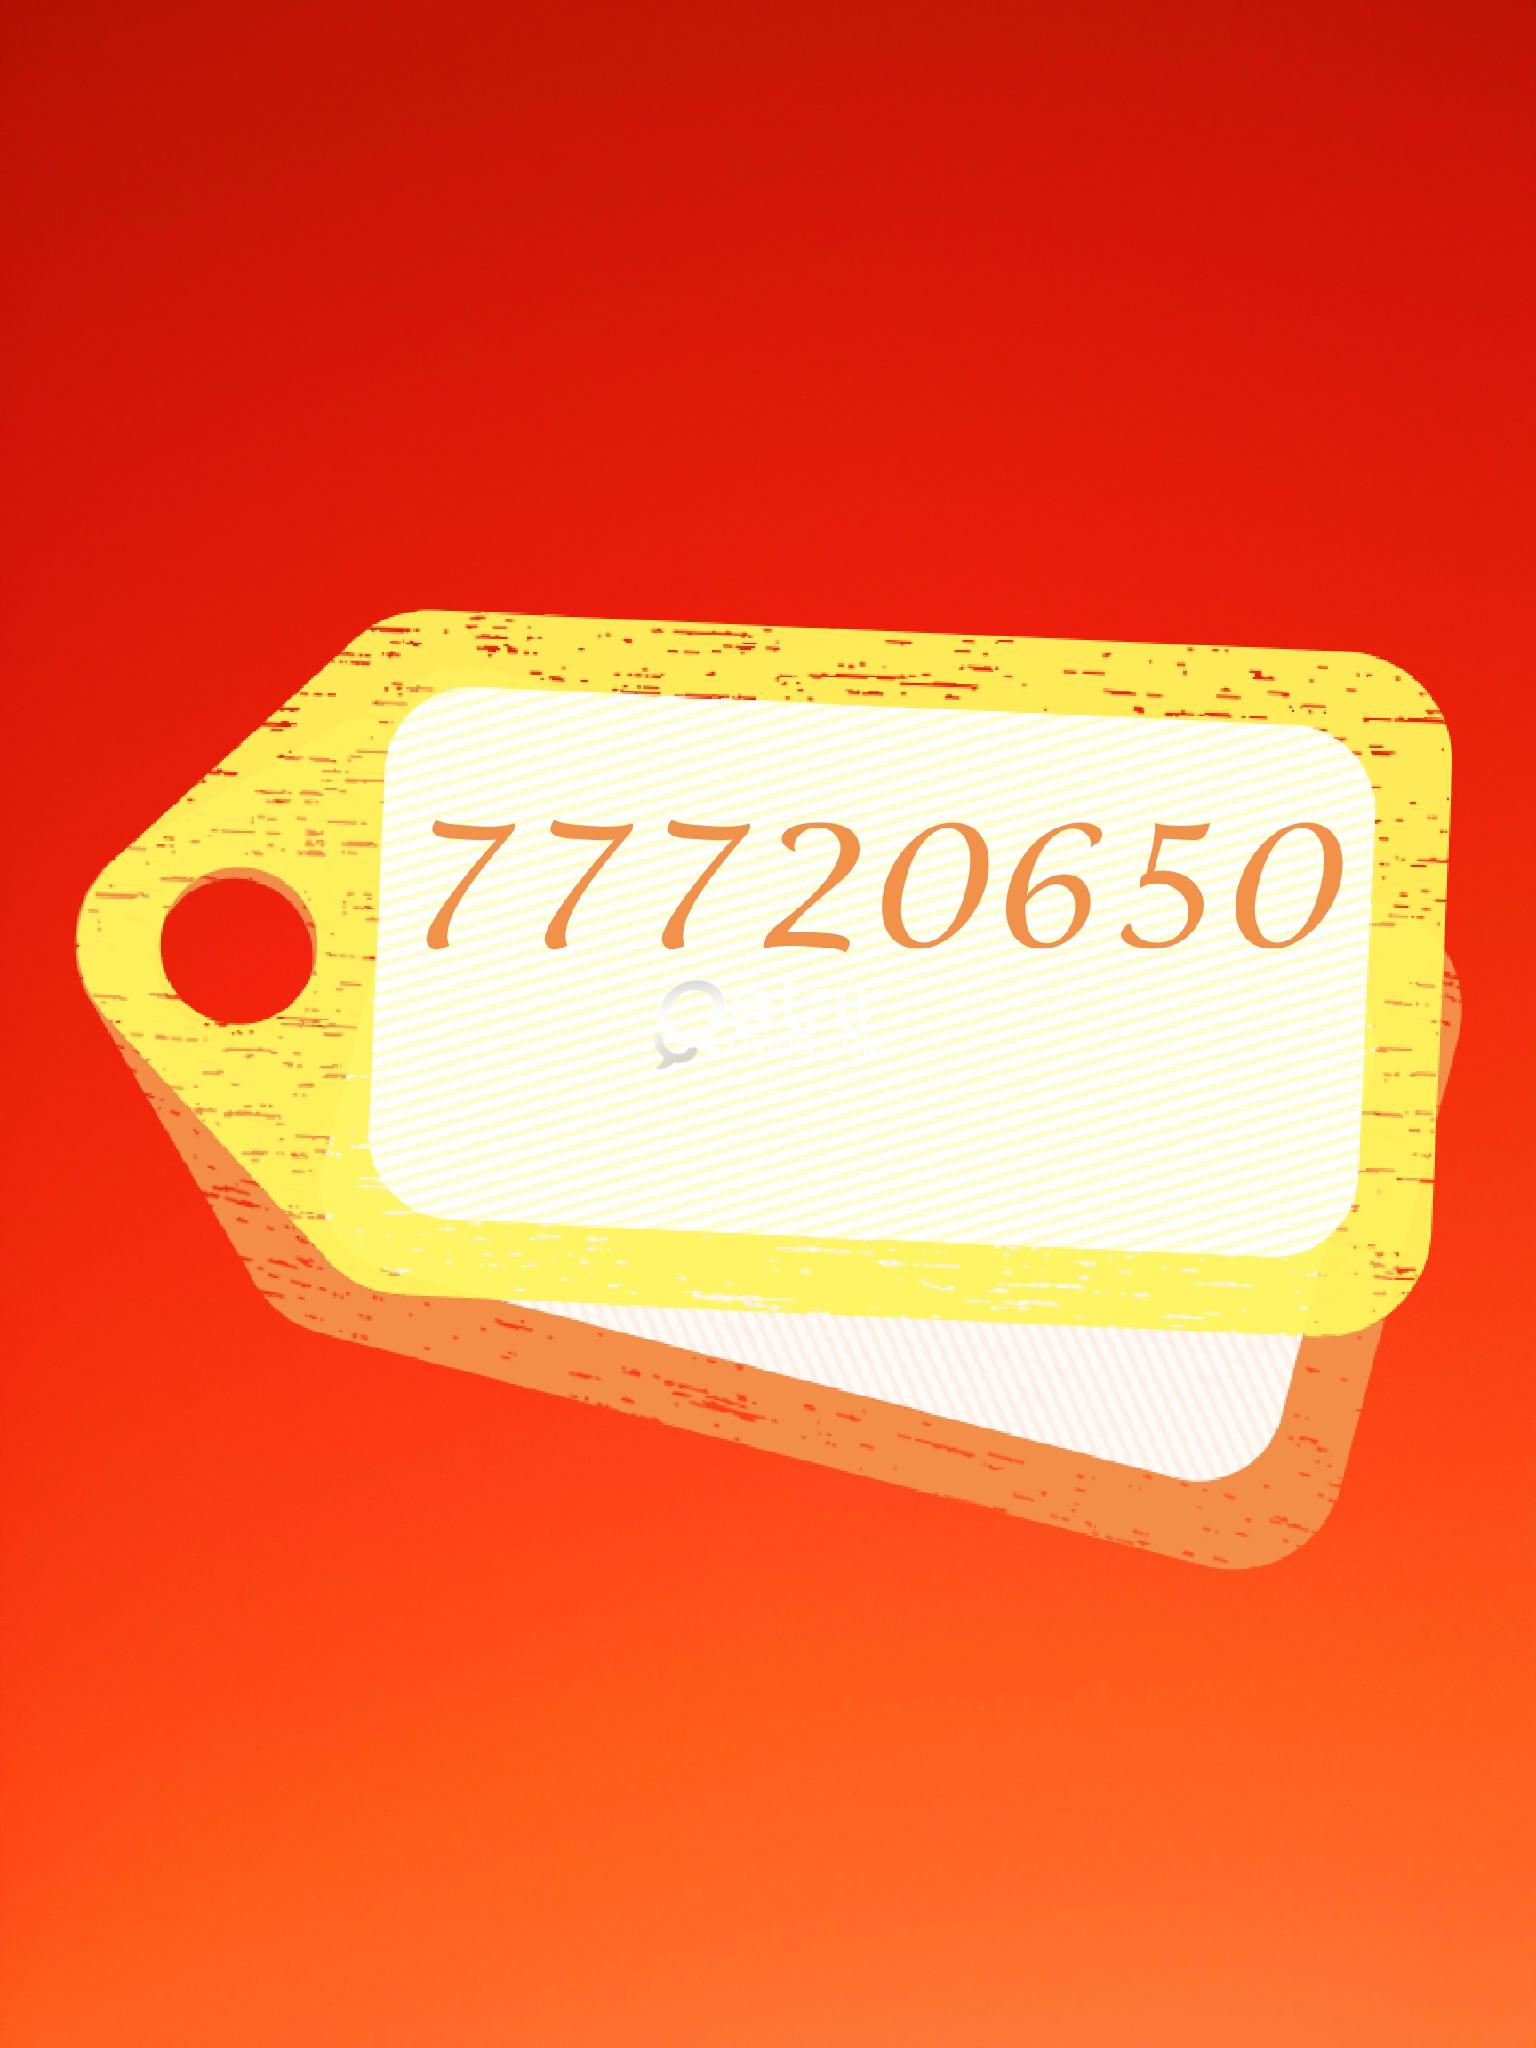 Voda phone